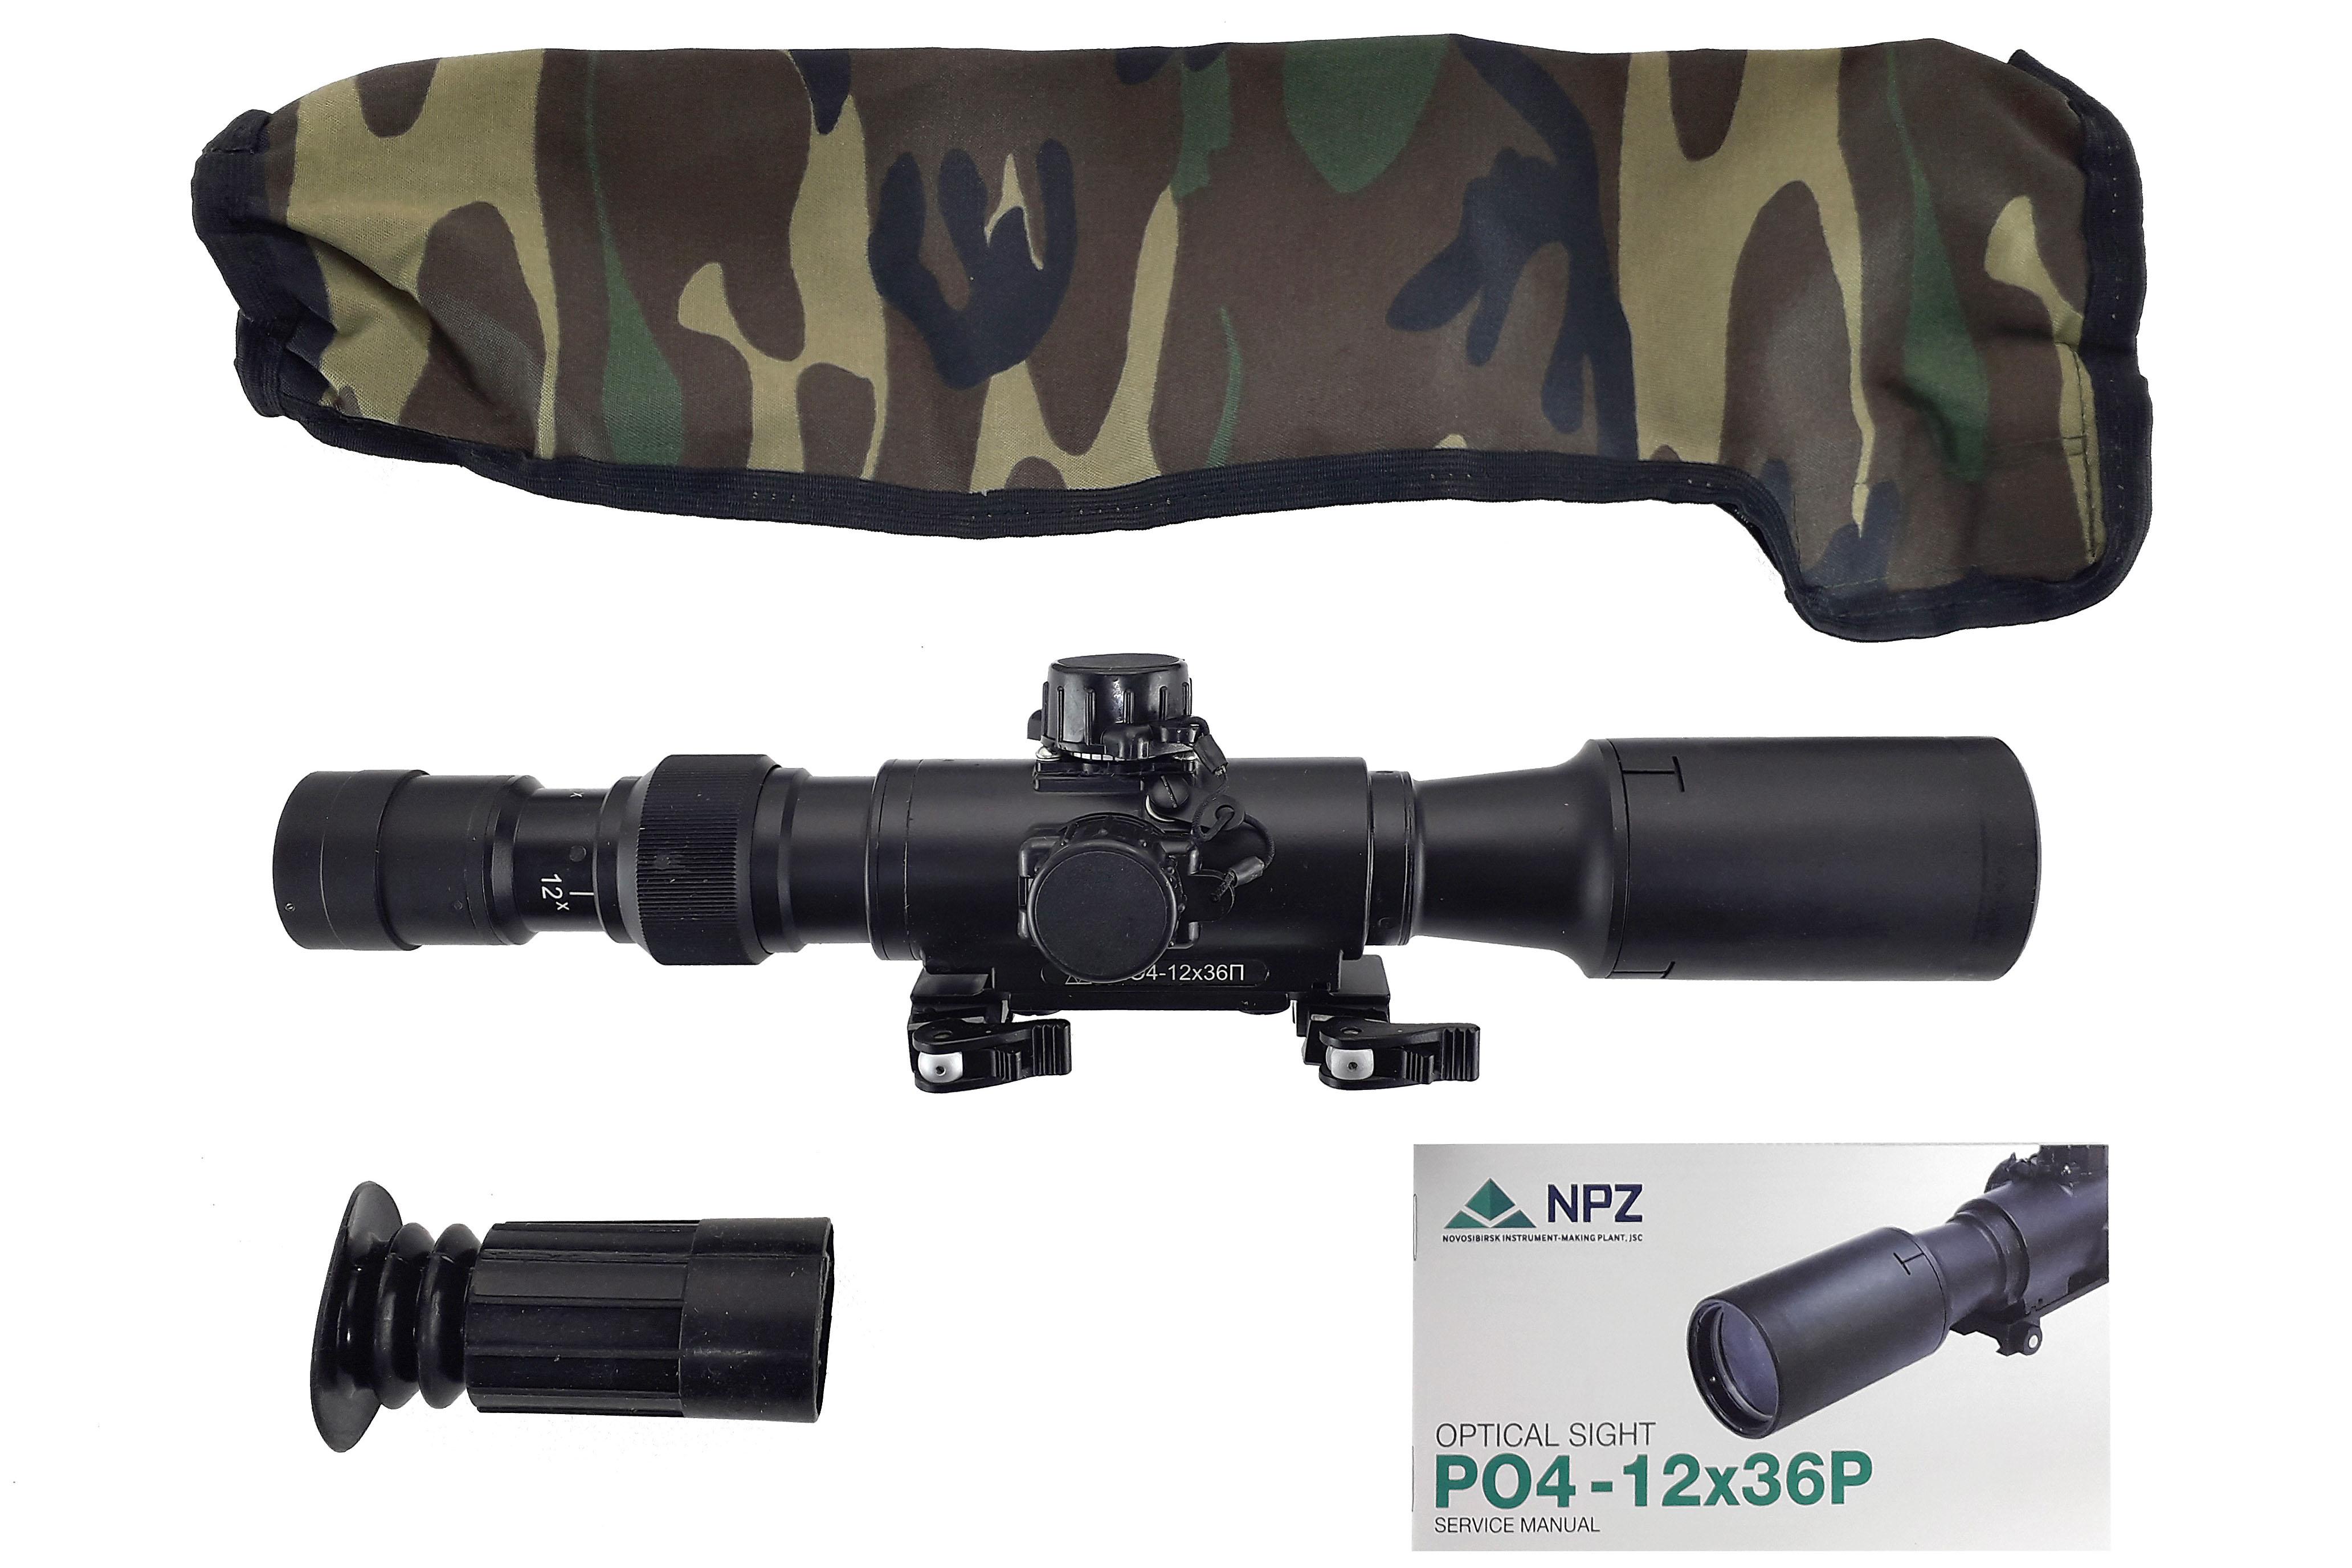 NPZ - PO 4-12X36 P